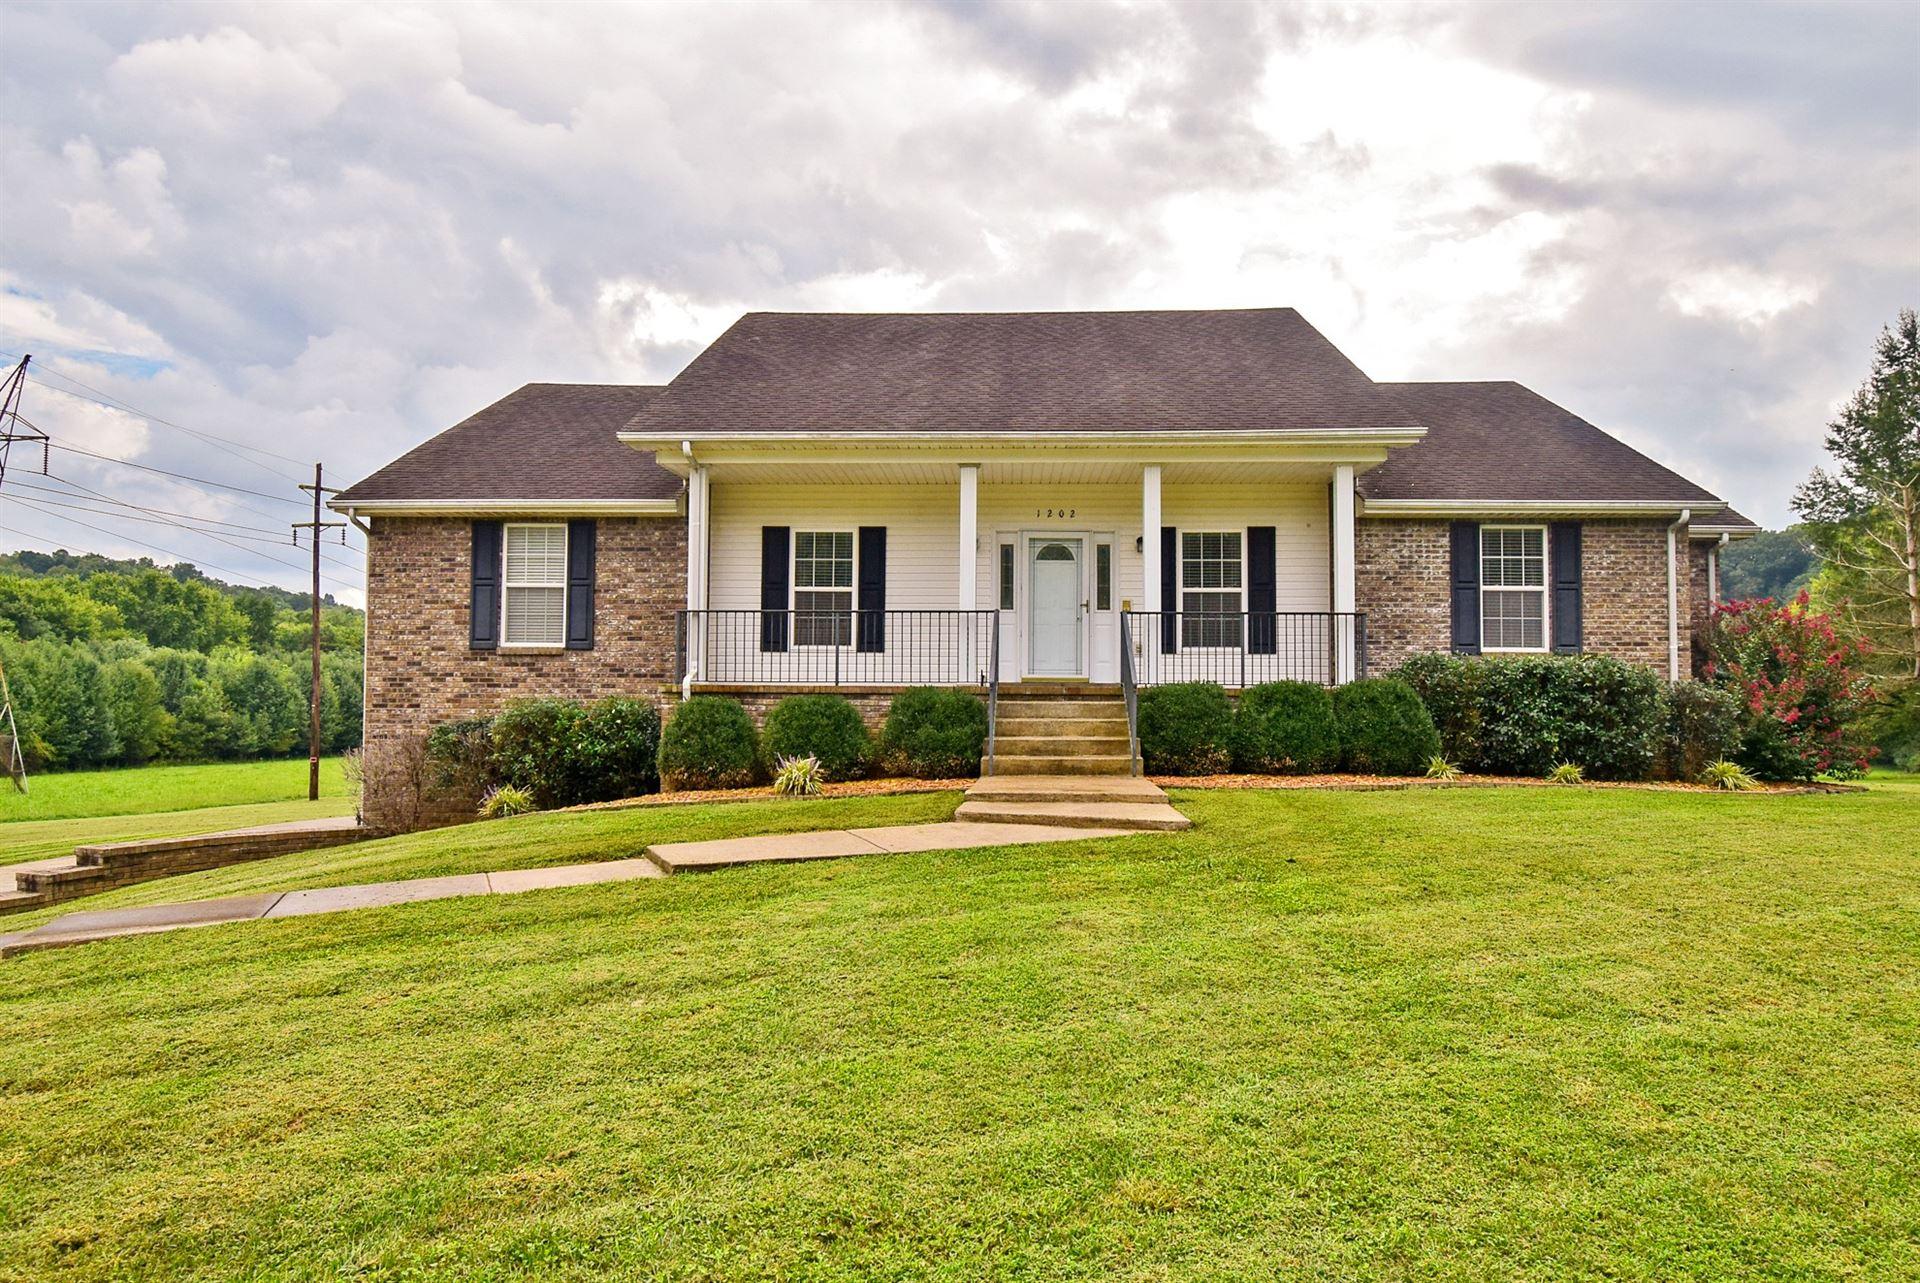 1202 Willow Bend Dr, Clarksville, TN 37043 - MLS#: 2293418